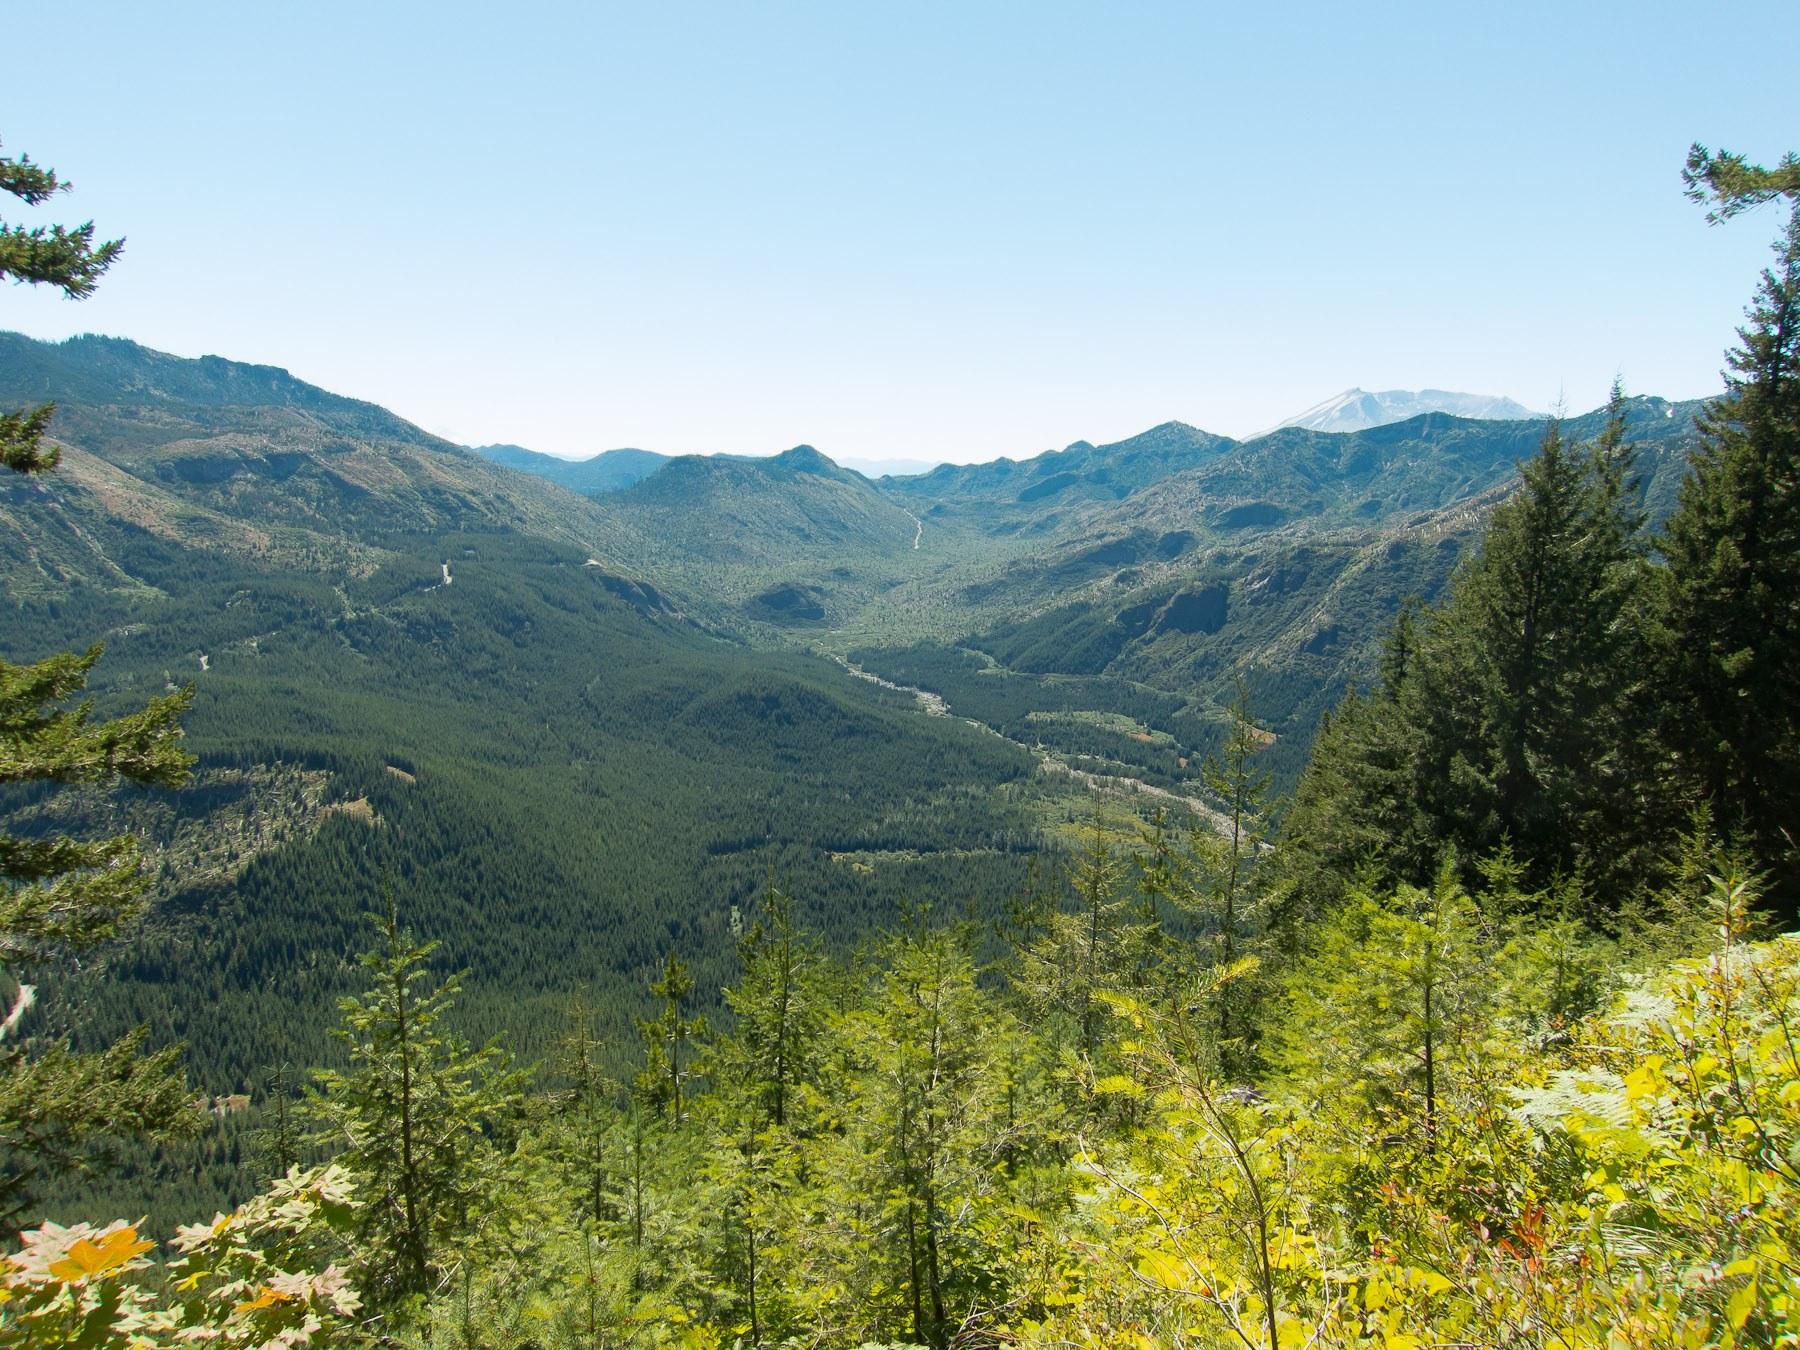 Goat Mountain Mine - Mount St. Helens.jpeg